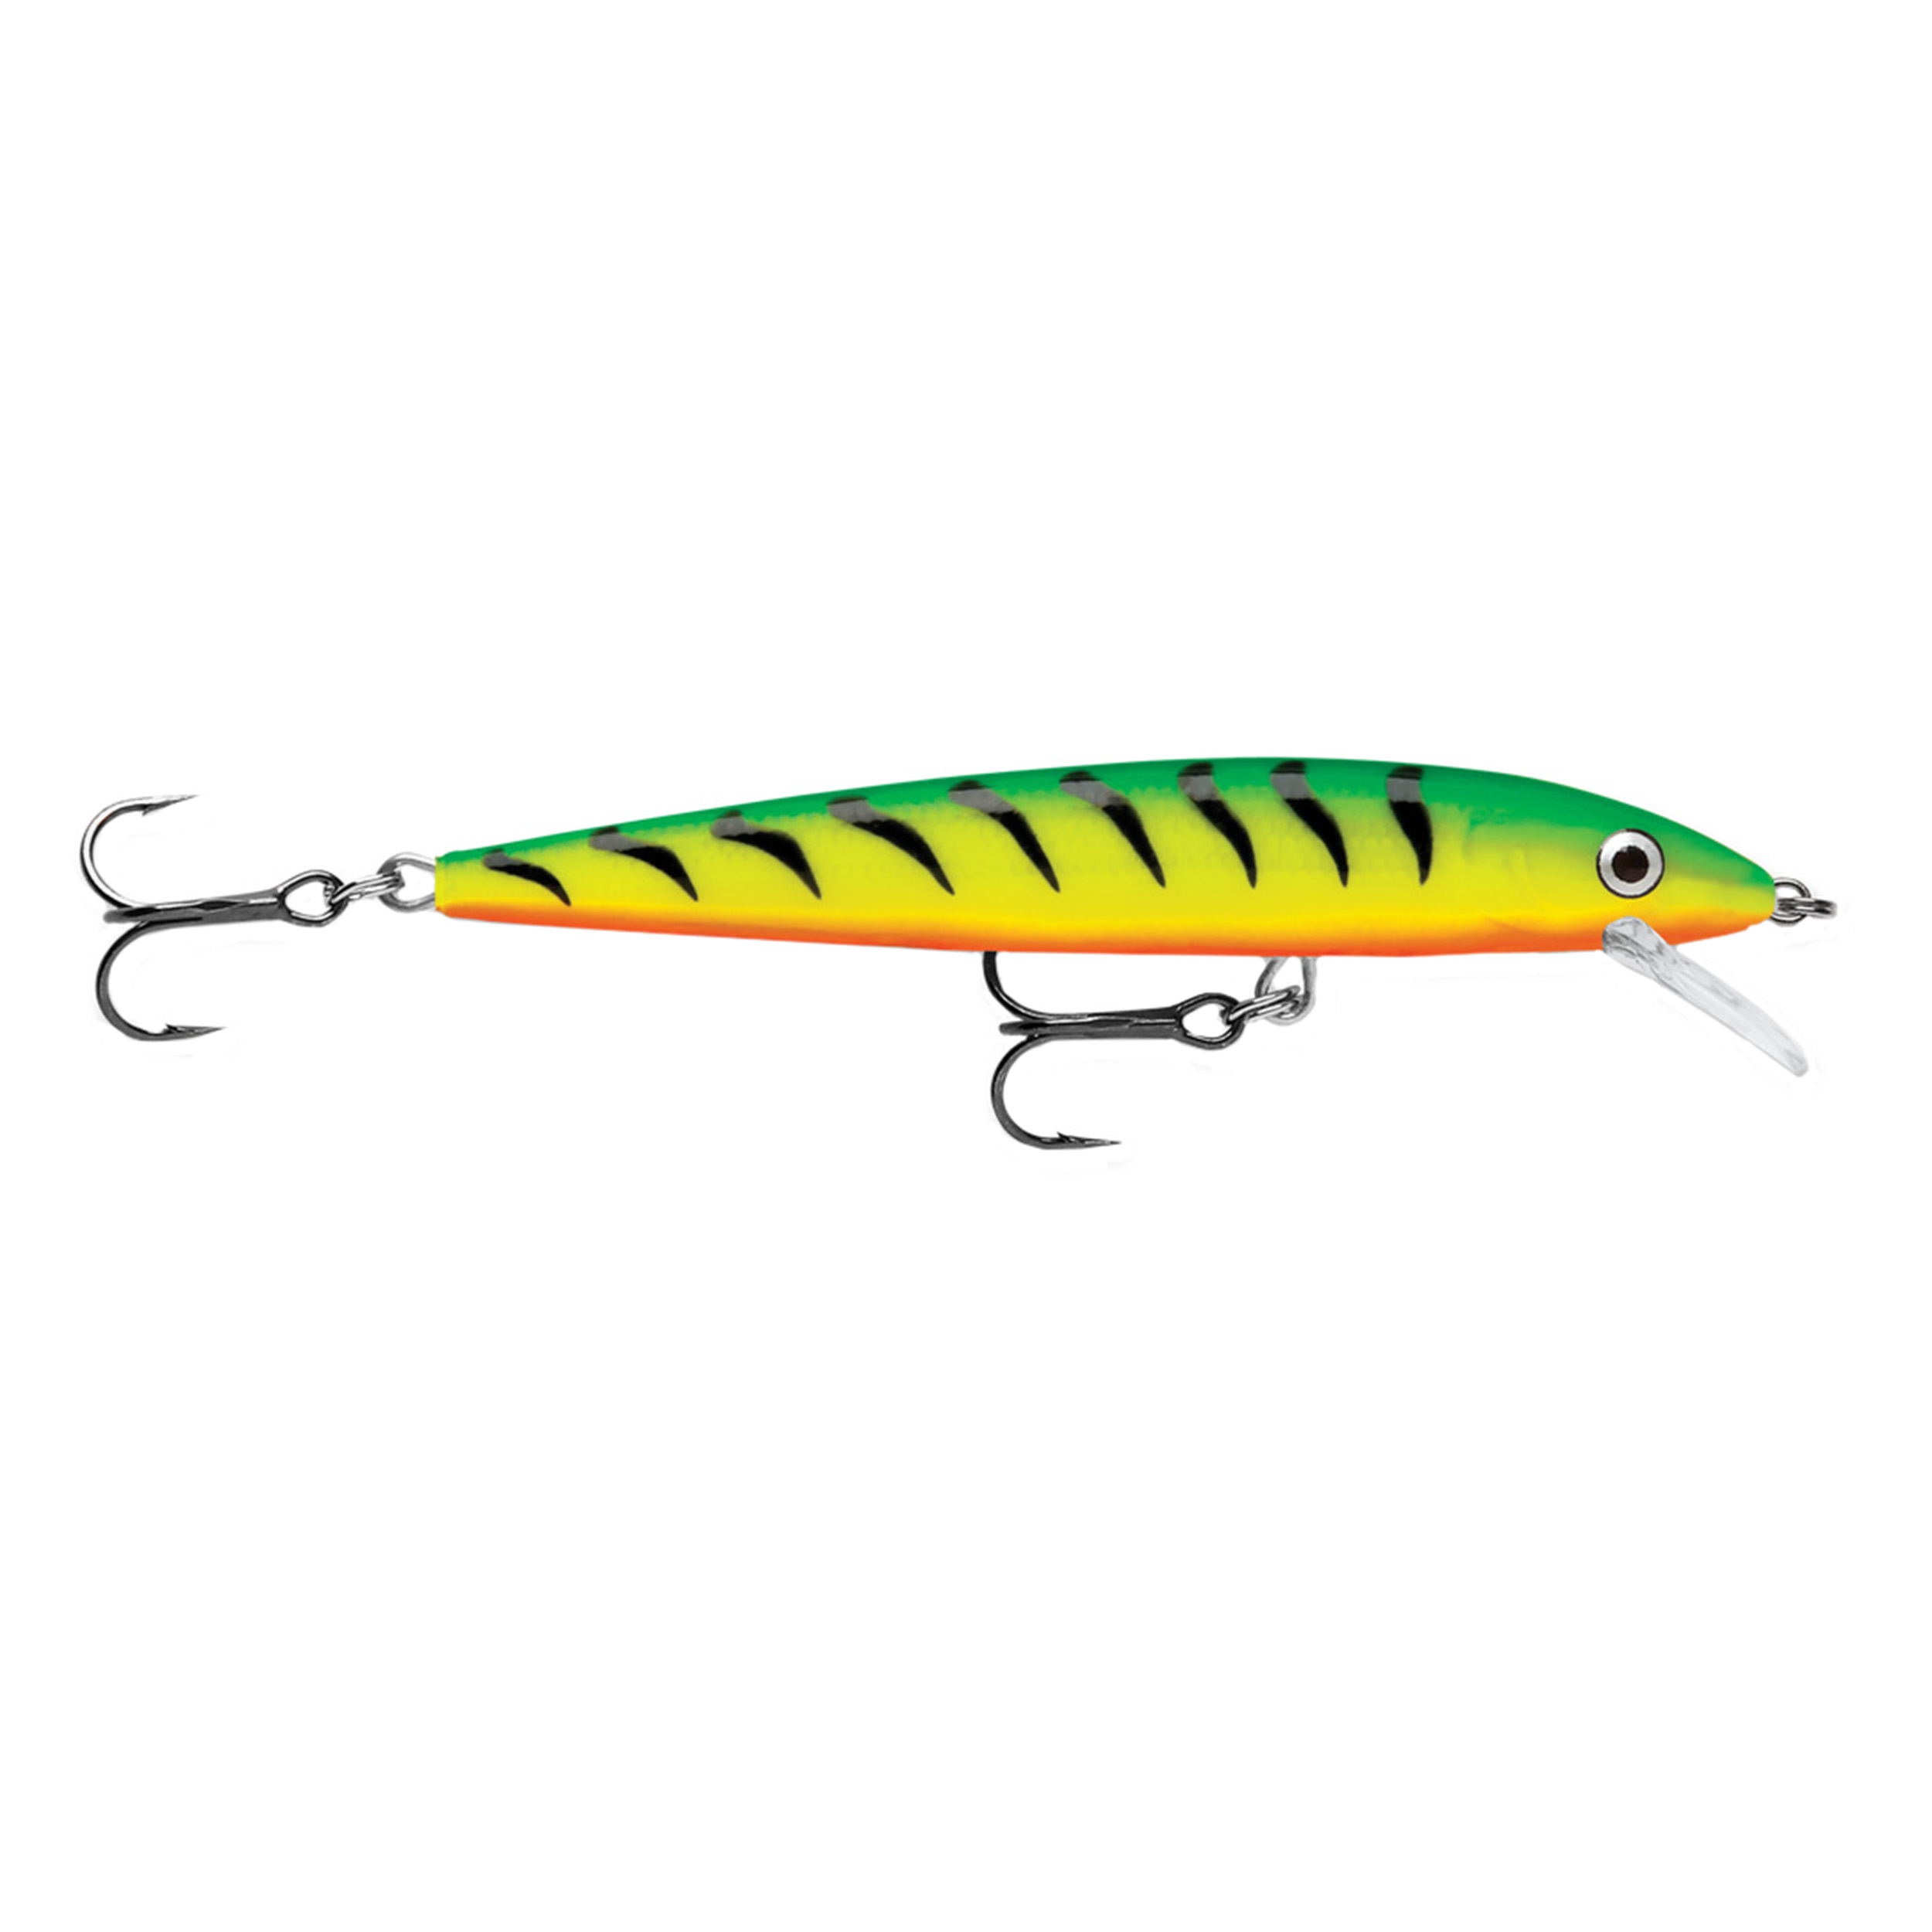 "Rapala Husky Jerk Lure Size 10, 4"" Length, 4'6' Depth, 2 Number 5 Treble Hooks, Fire Tiger, Per 1 by Rapala"